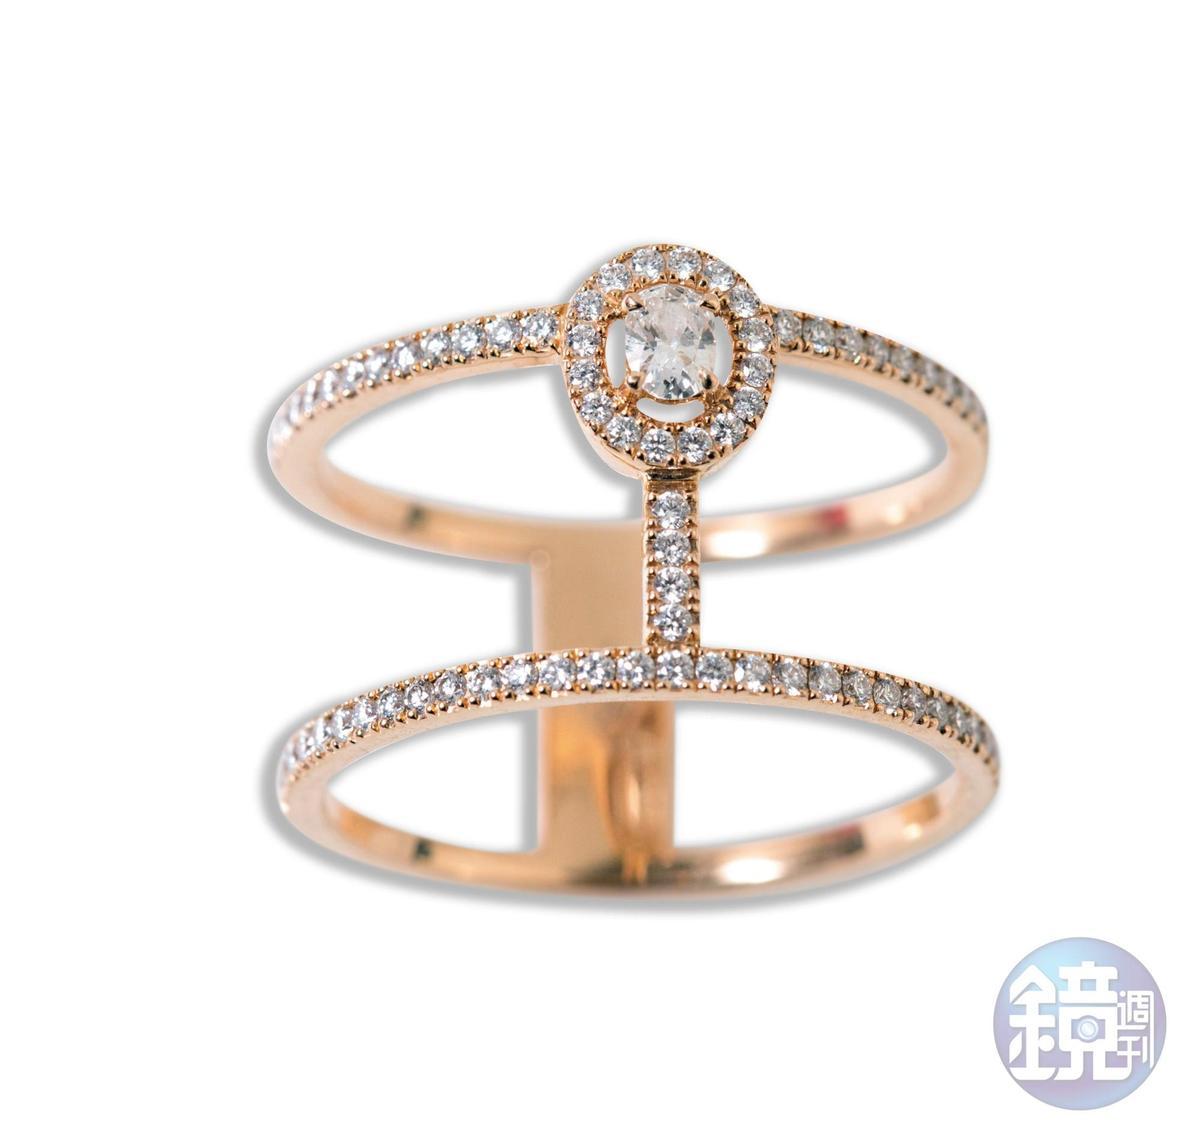 MESSIKA鑽石戒指,約NT$60,000。